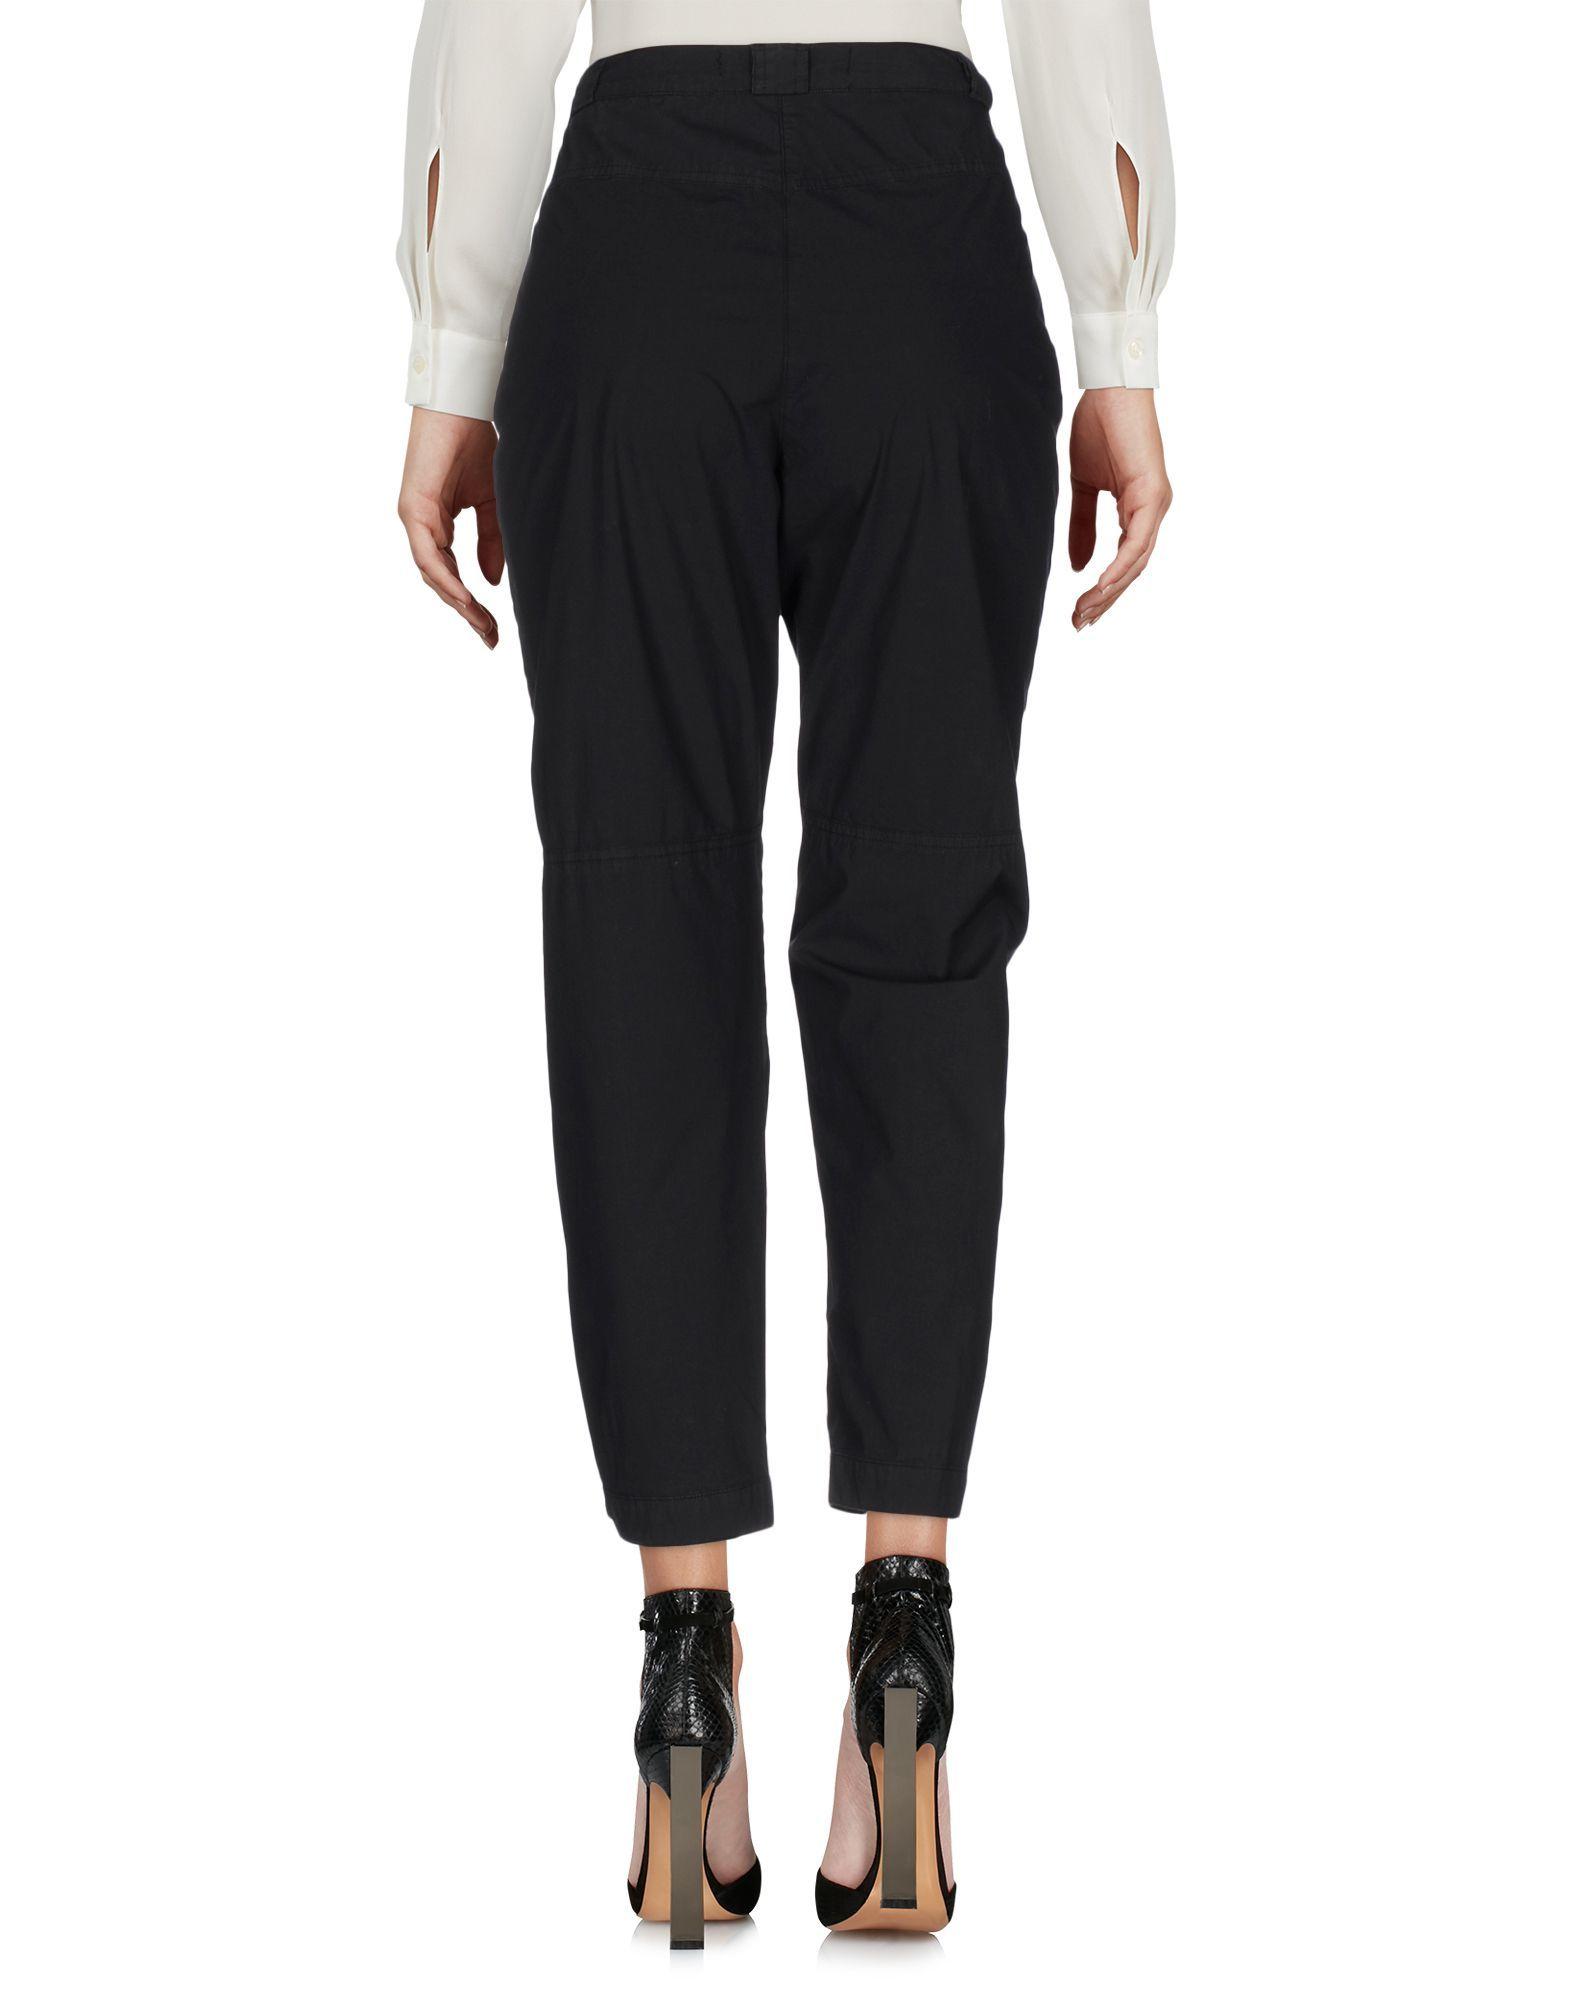 Pinko Black Cotton Trousers